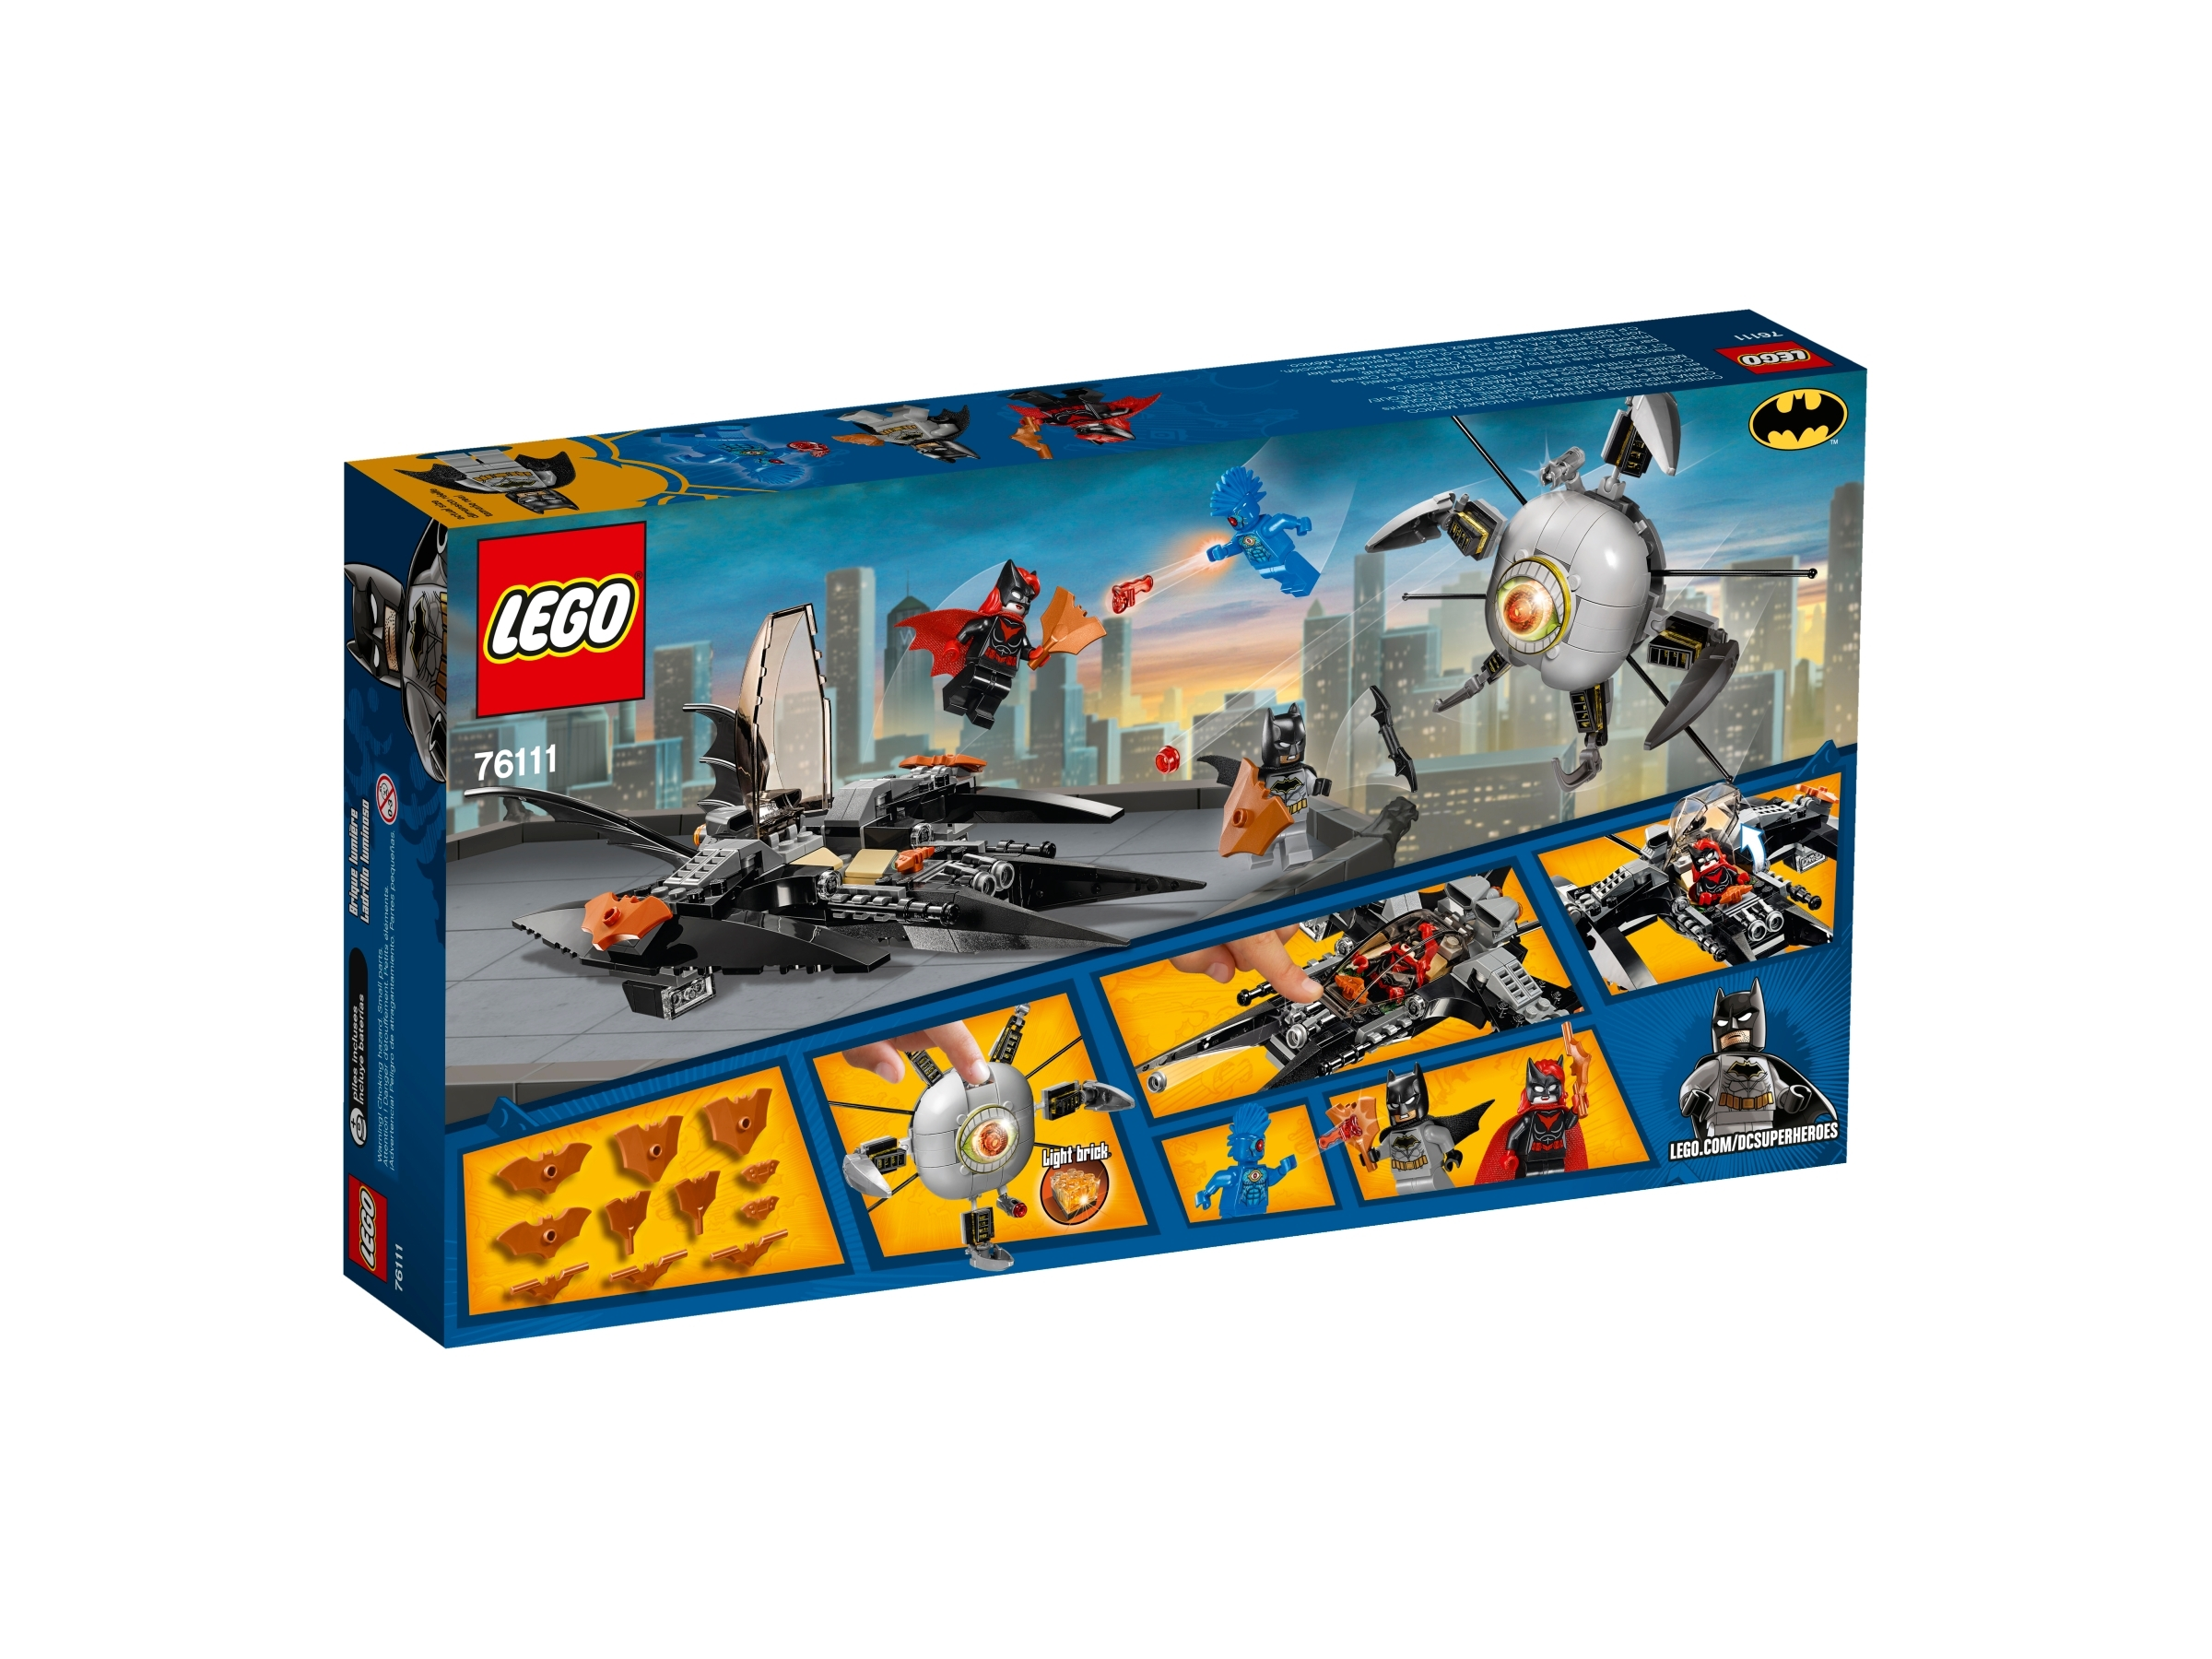 Batwoman Batman OMAC LEGO 76111 Super Heroes Brother Eye Takedown Light Brick